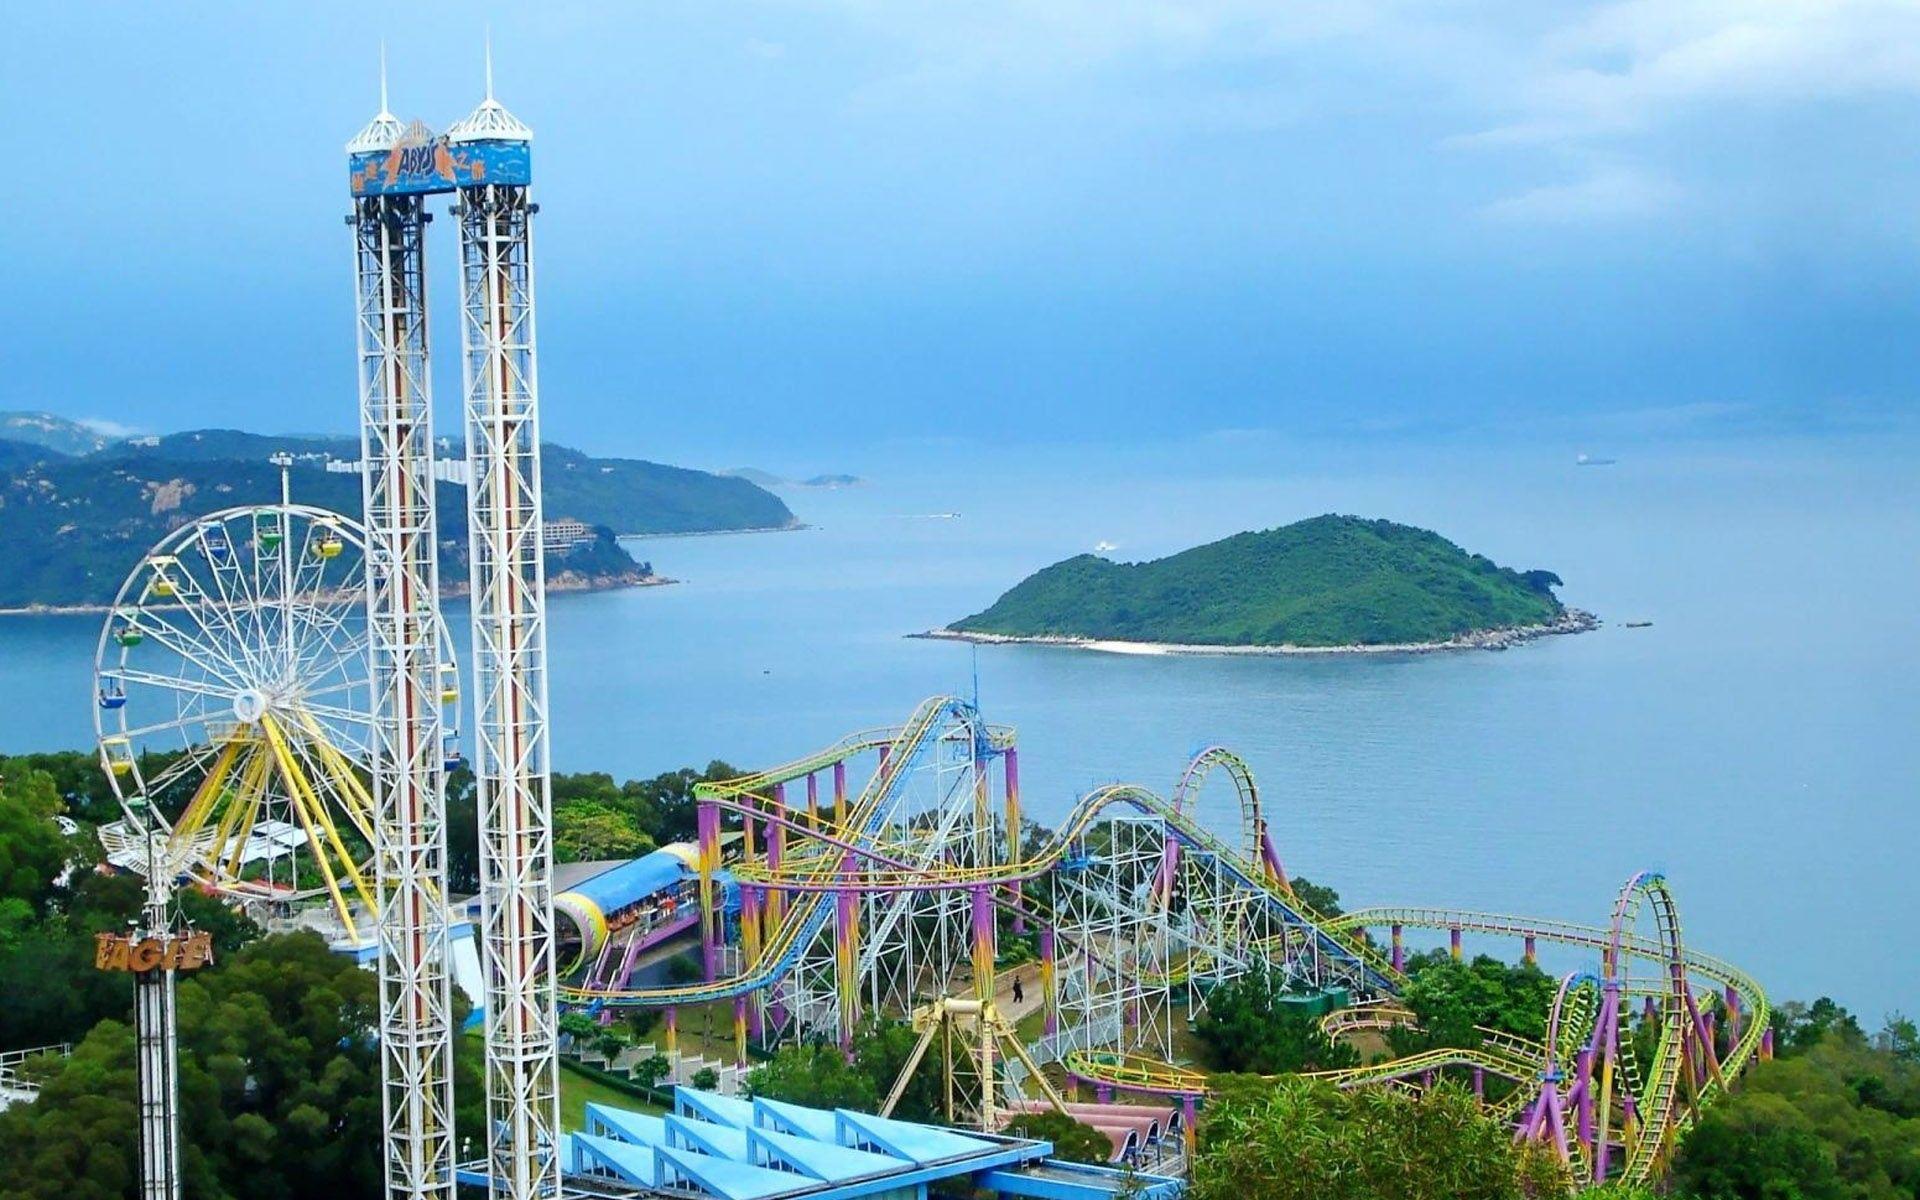 Hong Kong Disneyland Roller Coaster Hd Wallpapers Pinterest Tiket Ocean Park Bsd Paris